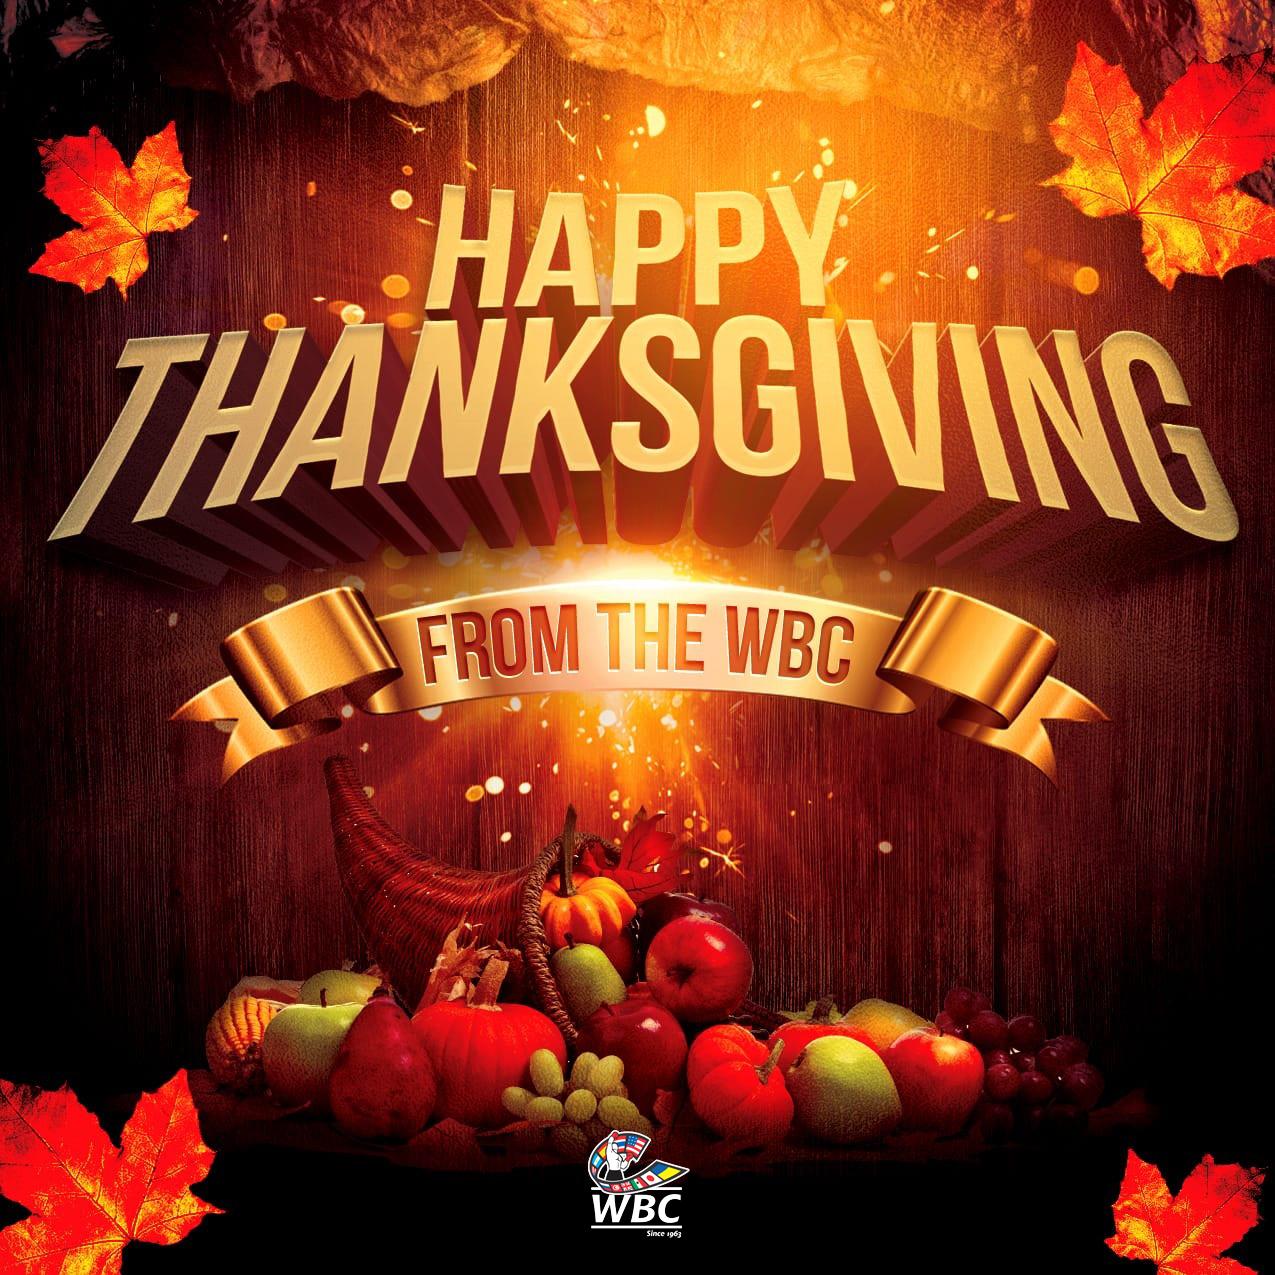 http://suljosblog.com/suljos/wp-content/uploads/2018/11/thanksgiving-2018-.jpg